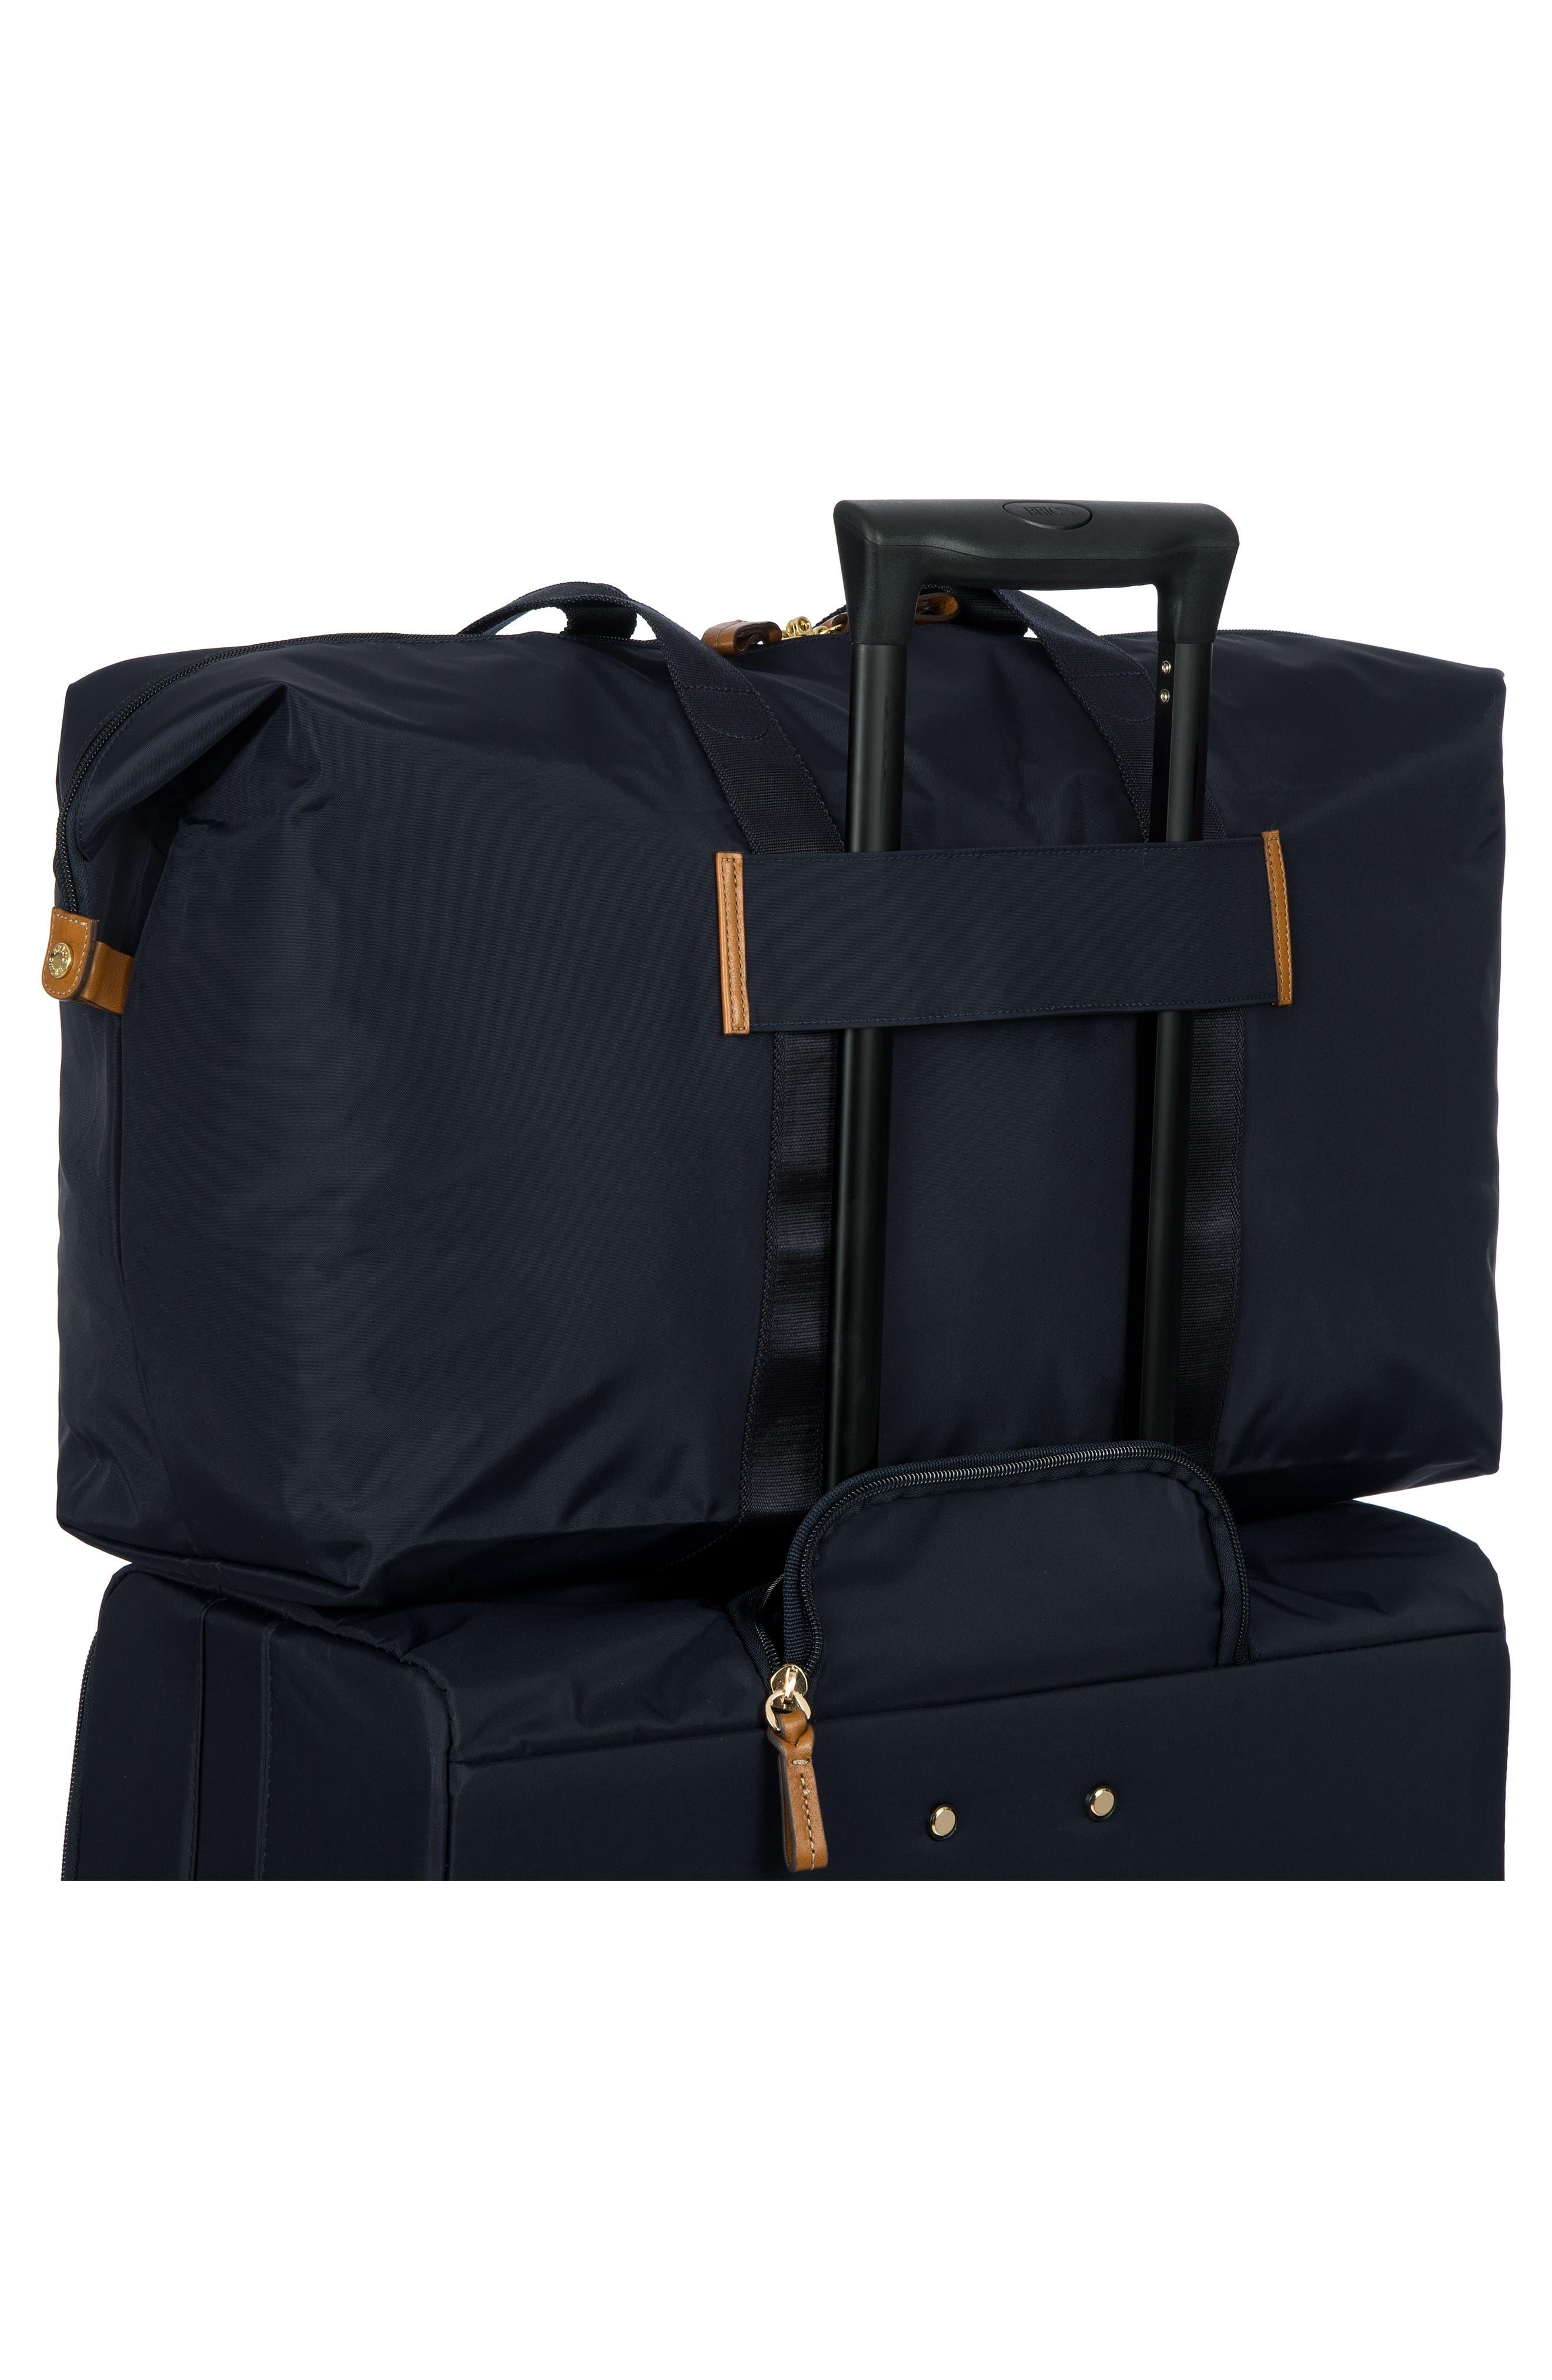 X-Bag 22-Inch Folding Duffel Bag,                             Alternate thumbnail 2, color,                             NAVY